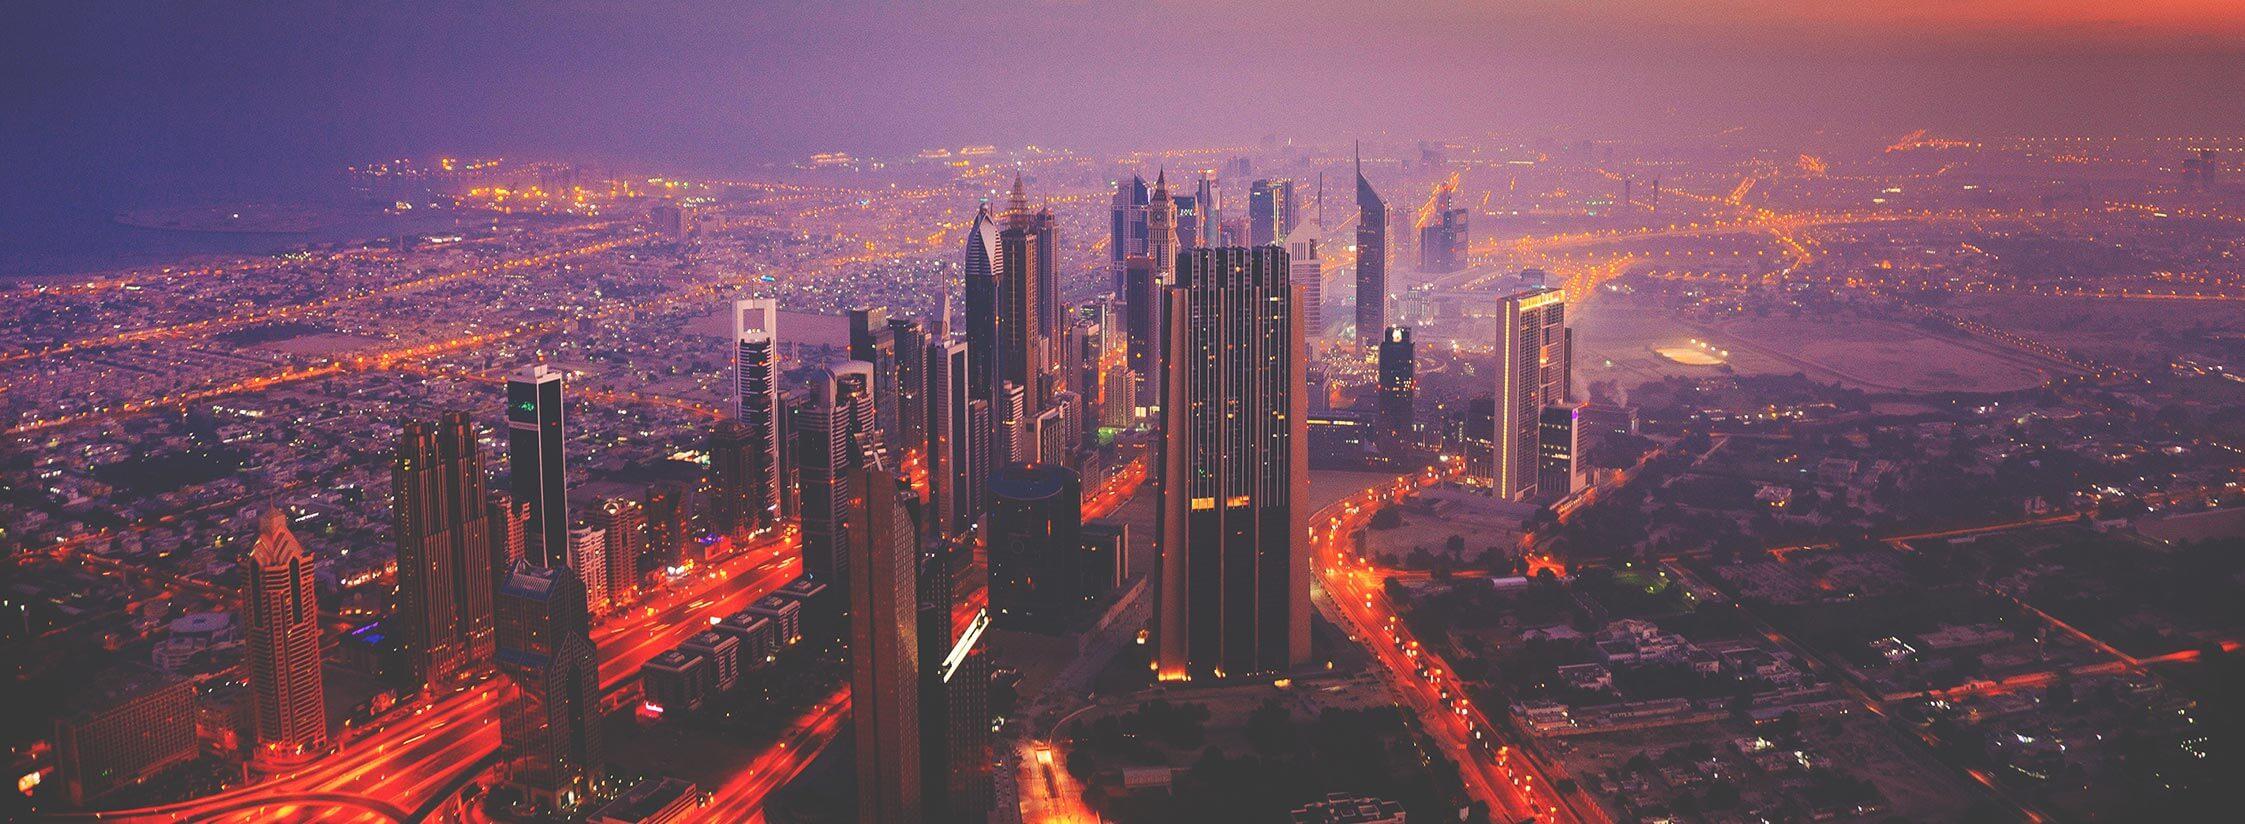 digital transformation examples city